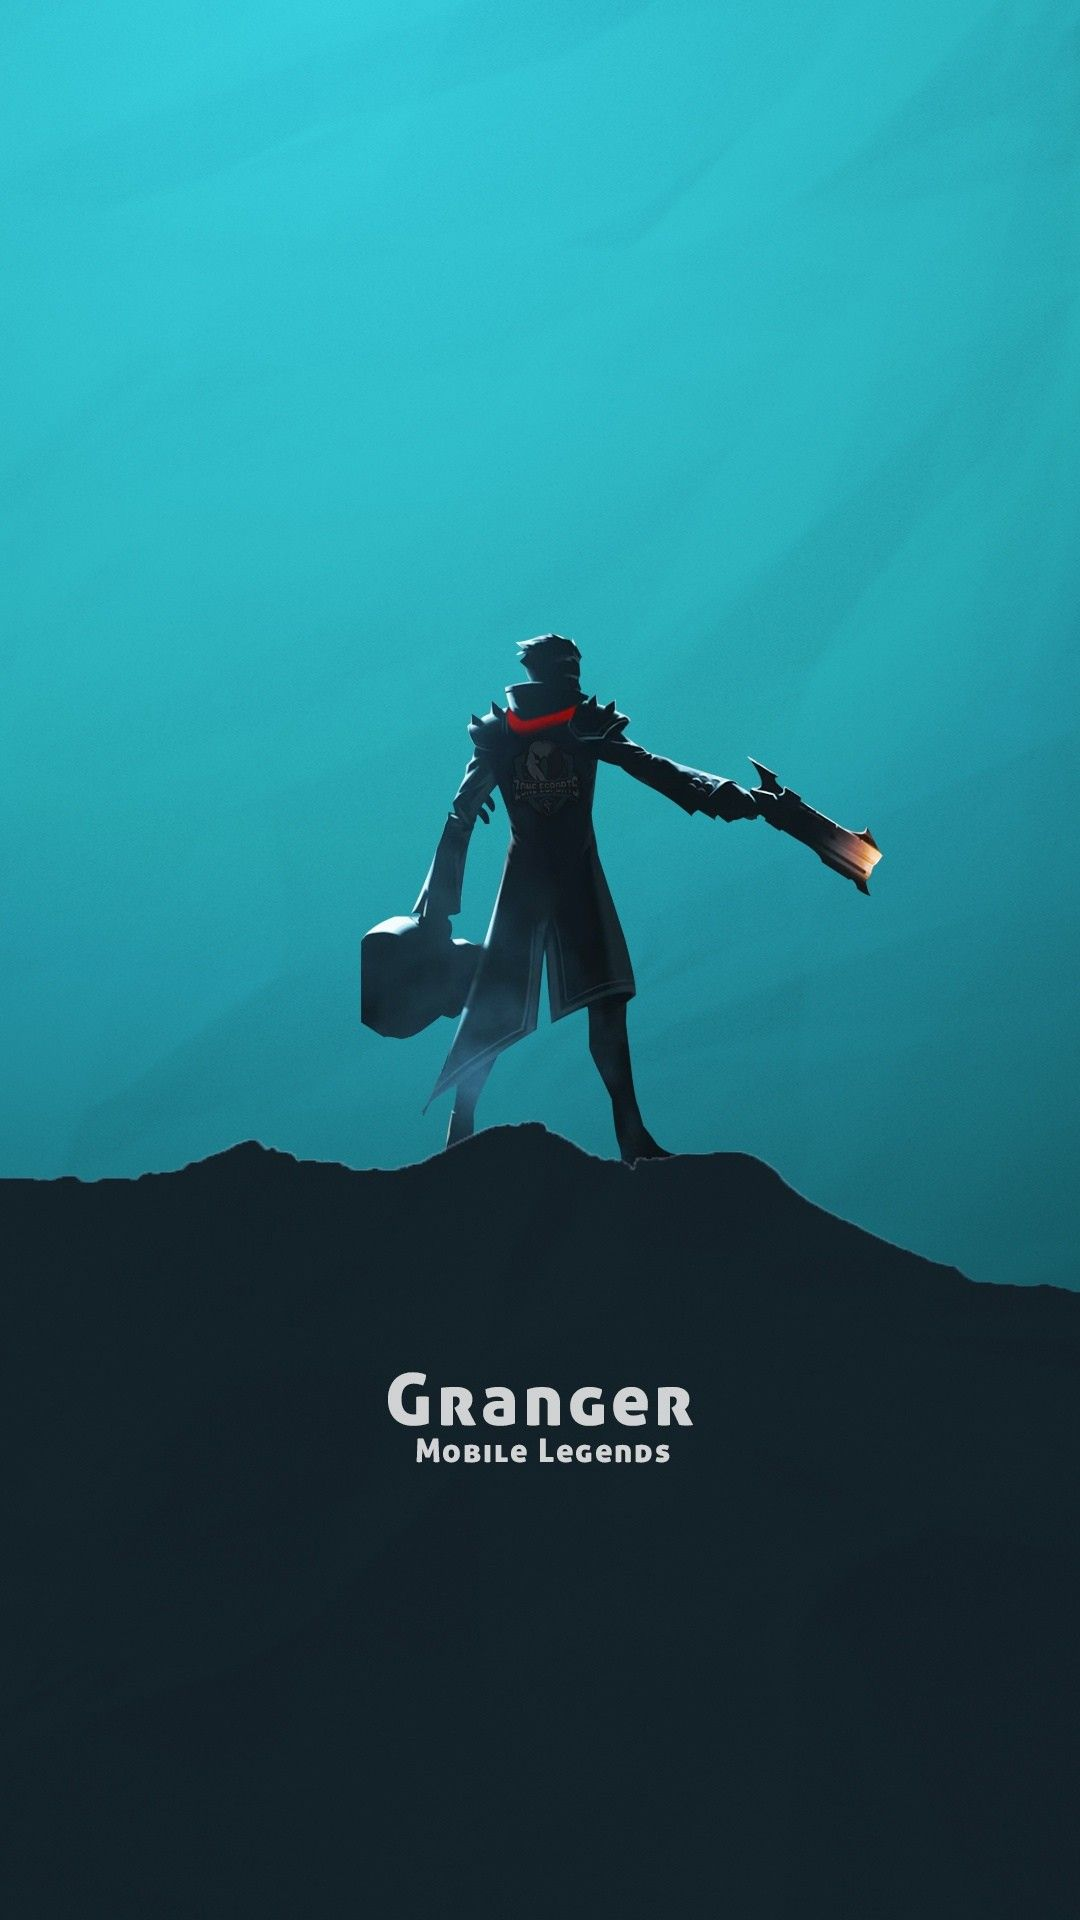 Granger Foto Lucu Gambar Lucu Kartun